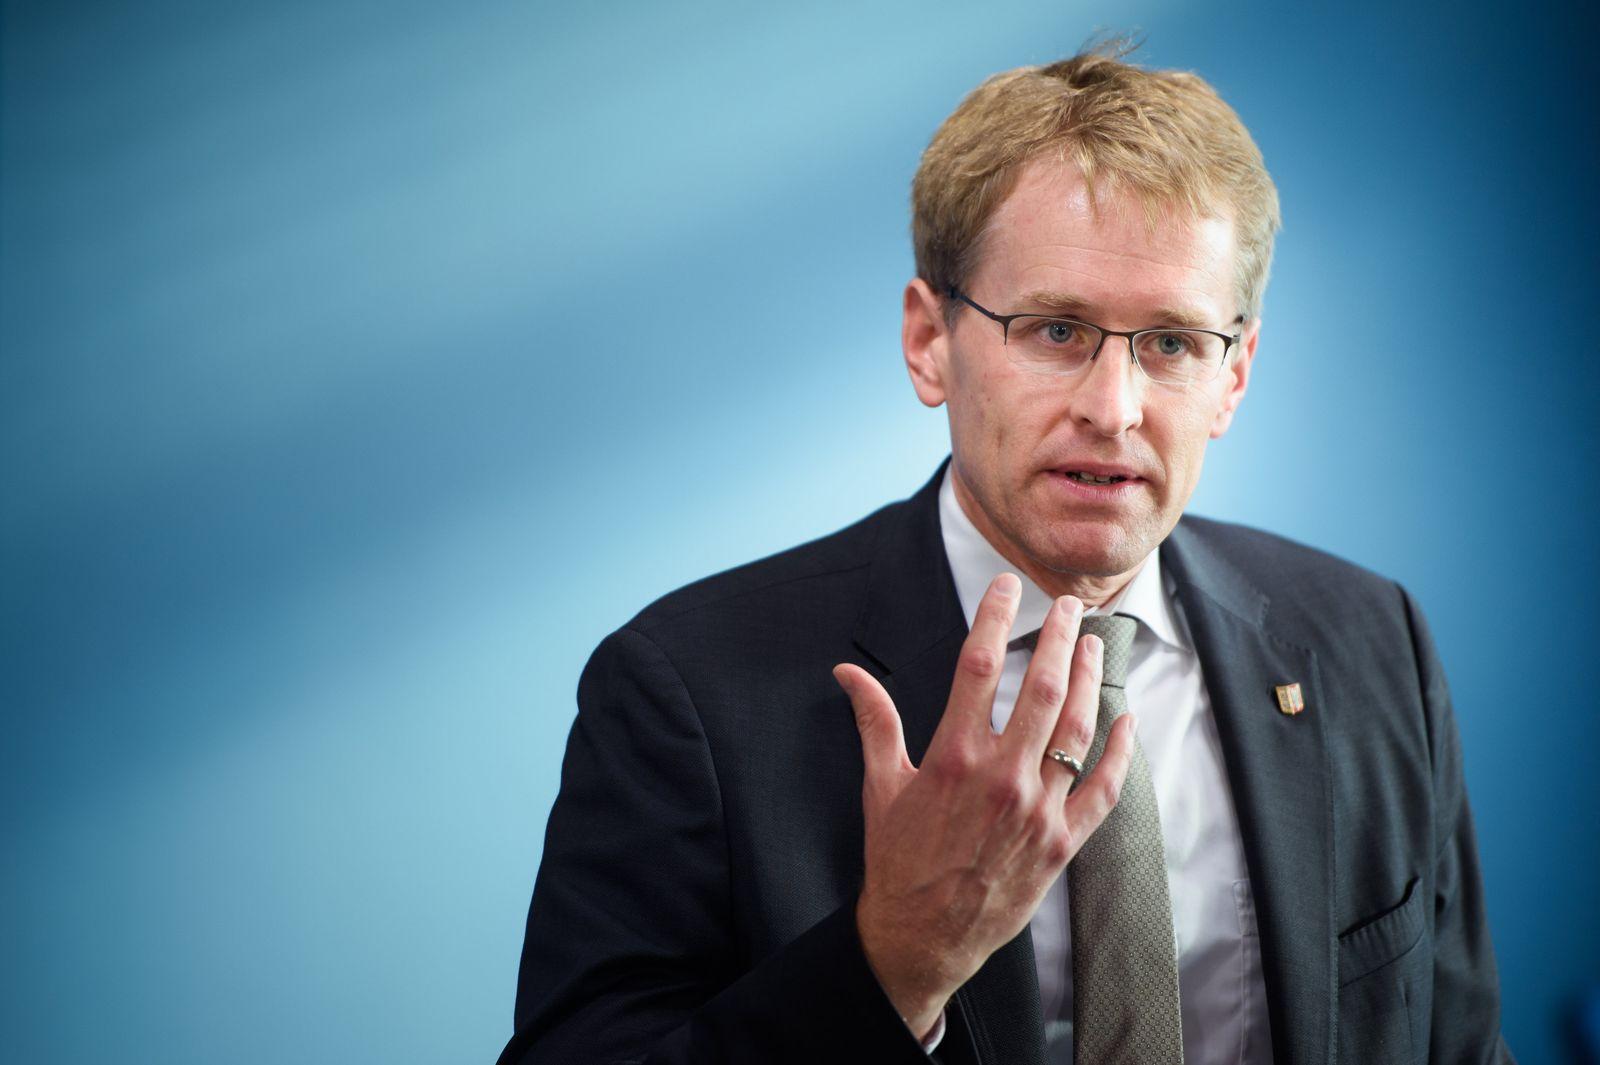 Ministerpräsident Günther zu neuen Corona-Maßnahmen